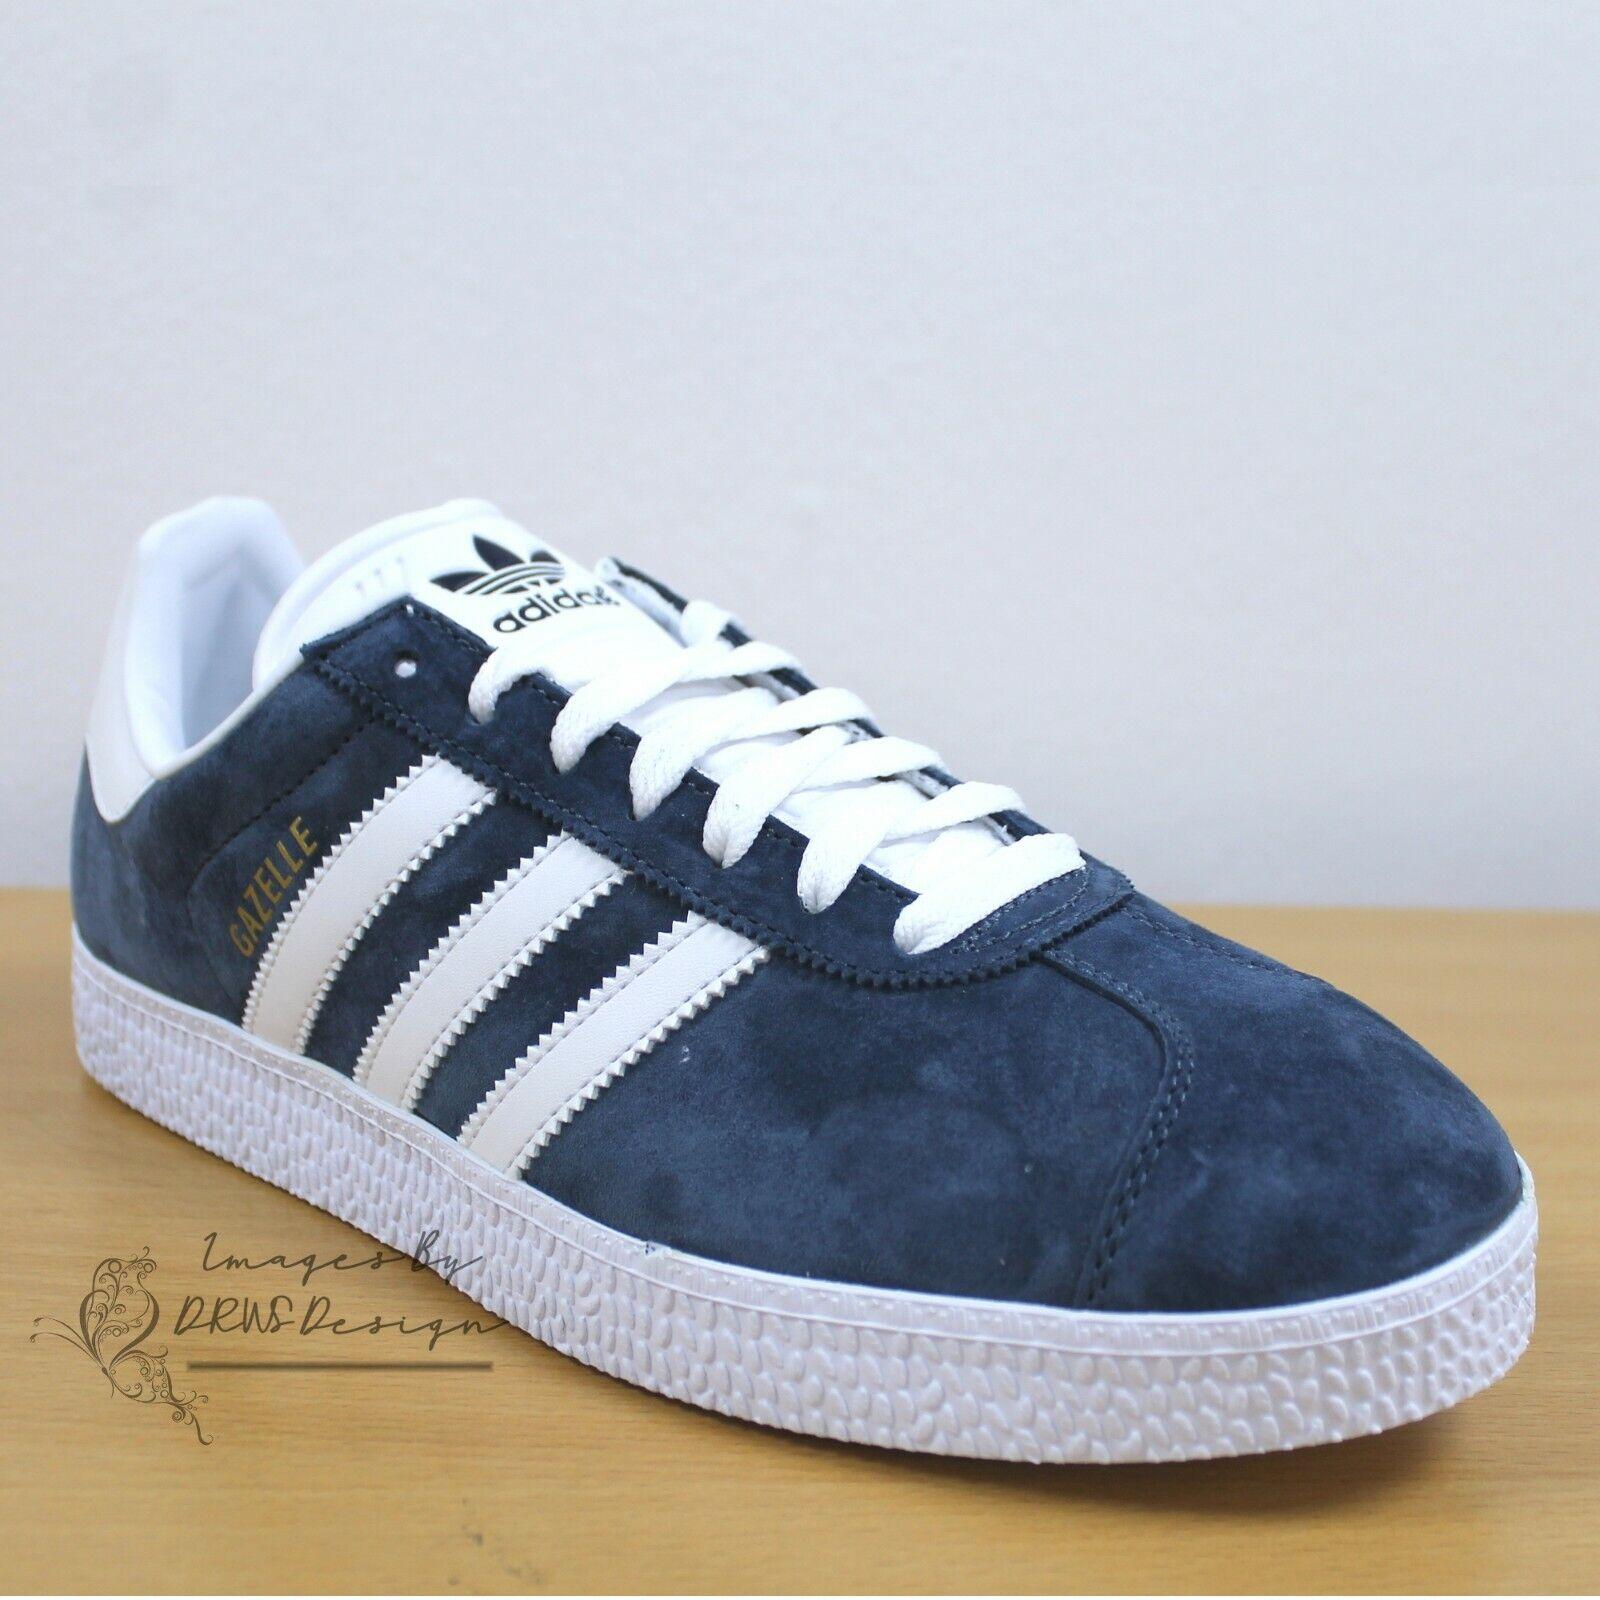 tetraedro himno Nacional visa  Adidas Originals Gazelle OG & Gazelle II Men's Trainers Retro Casual  Sneakers 🔥   eBay